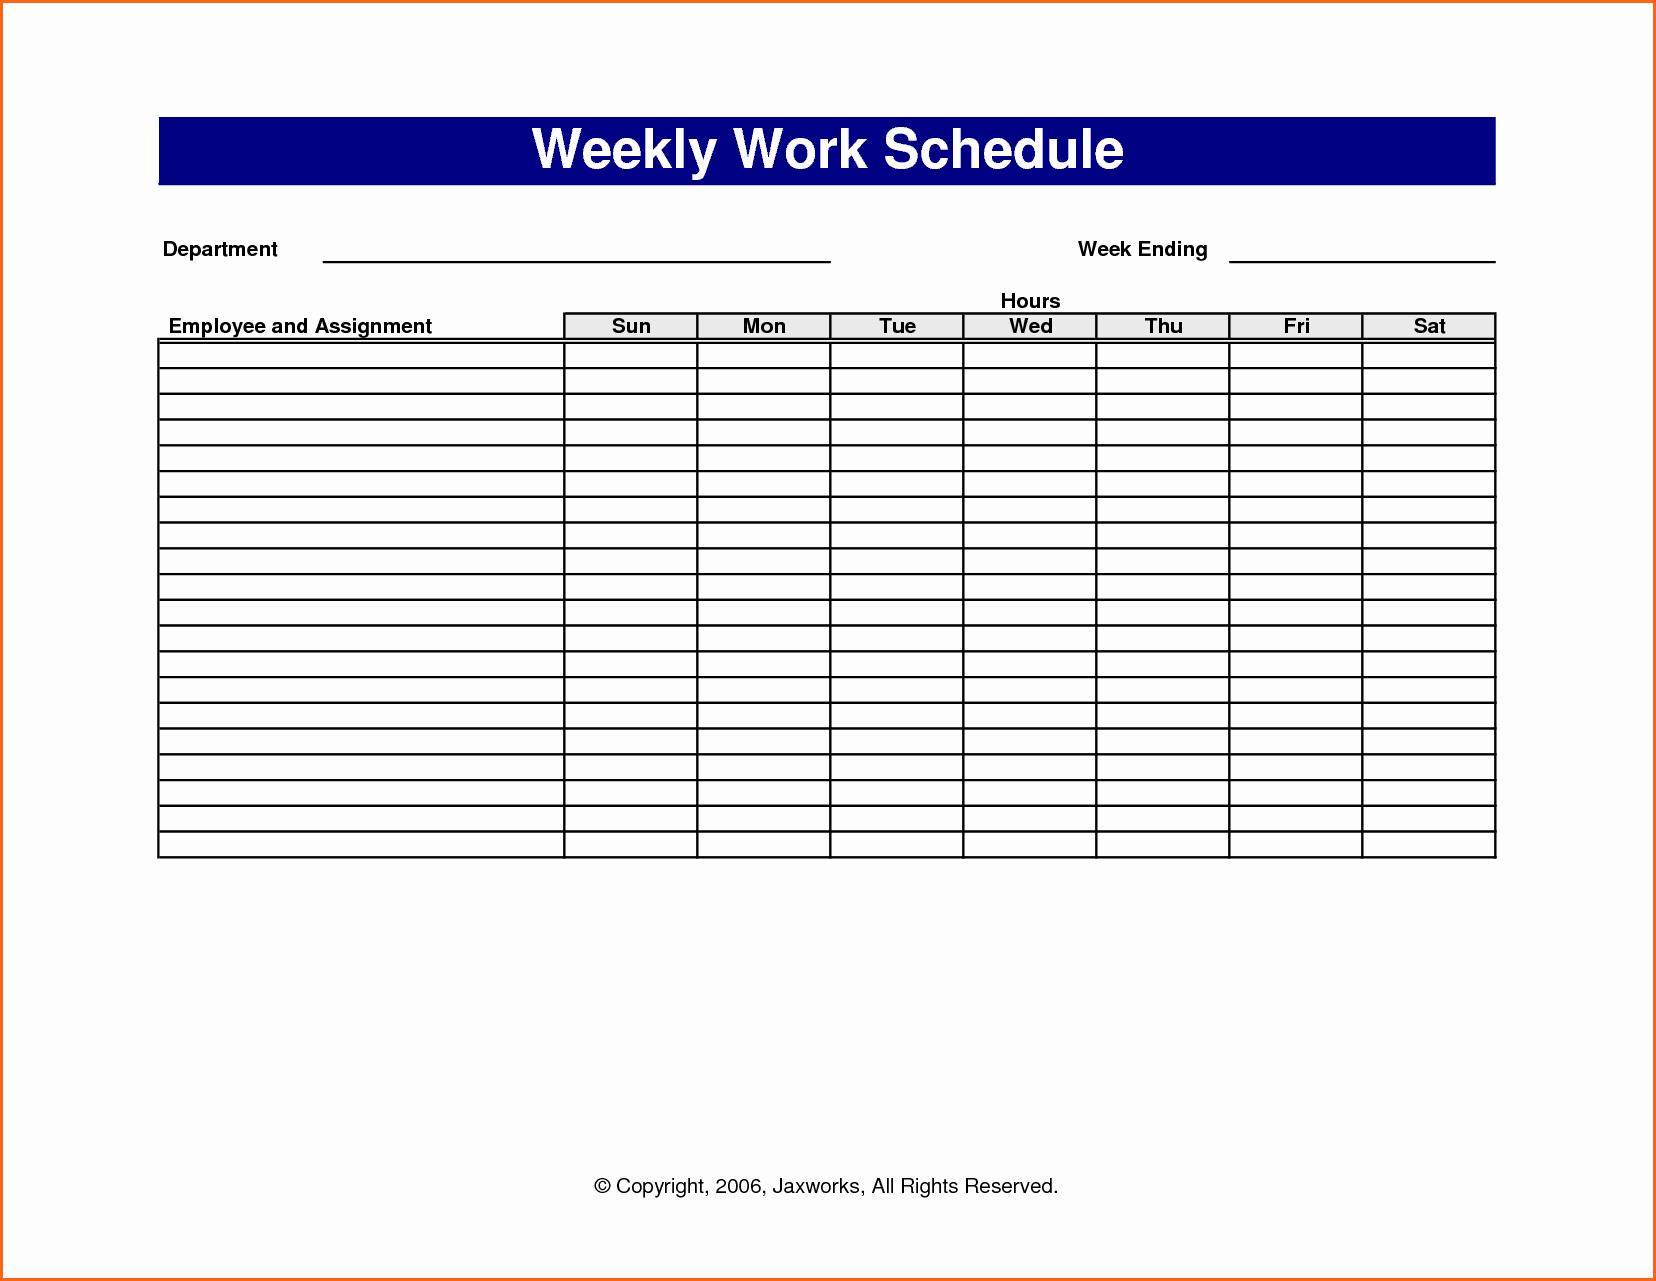 Monthly Work Schedule Template Excel Unique 6 Weekly Work Schedule Template Excel Bud Template